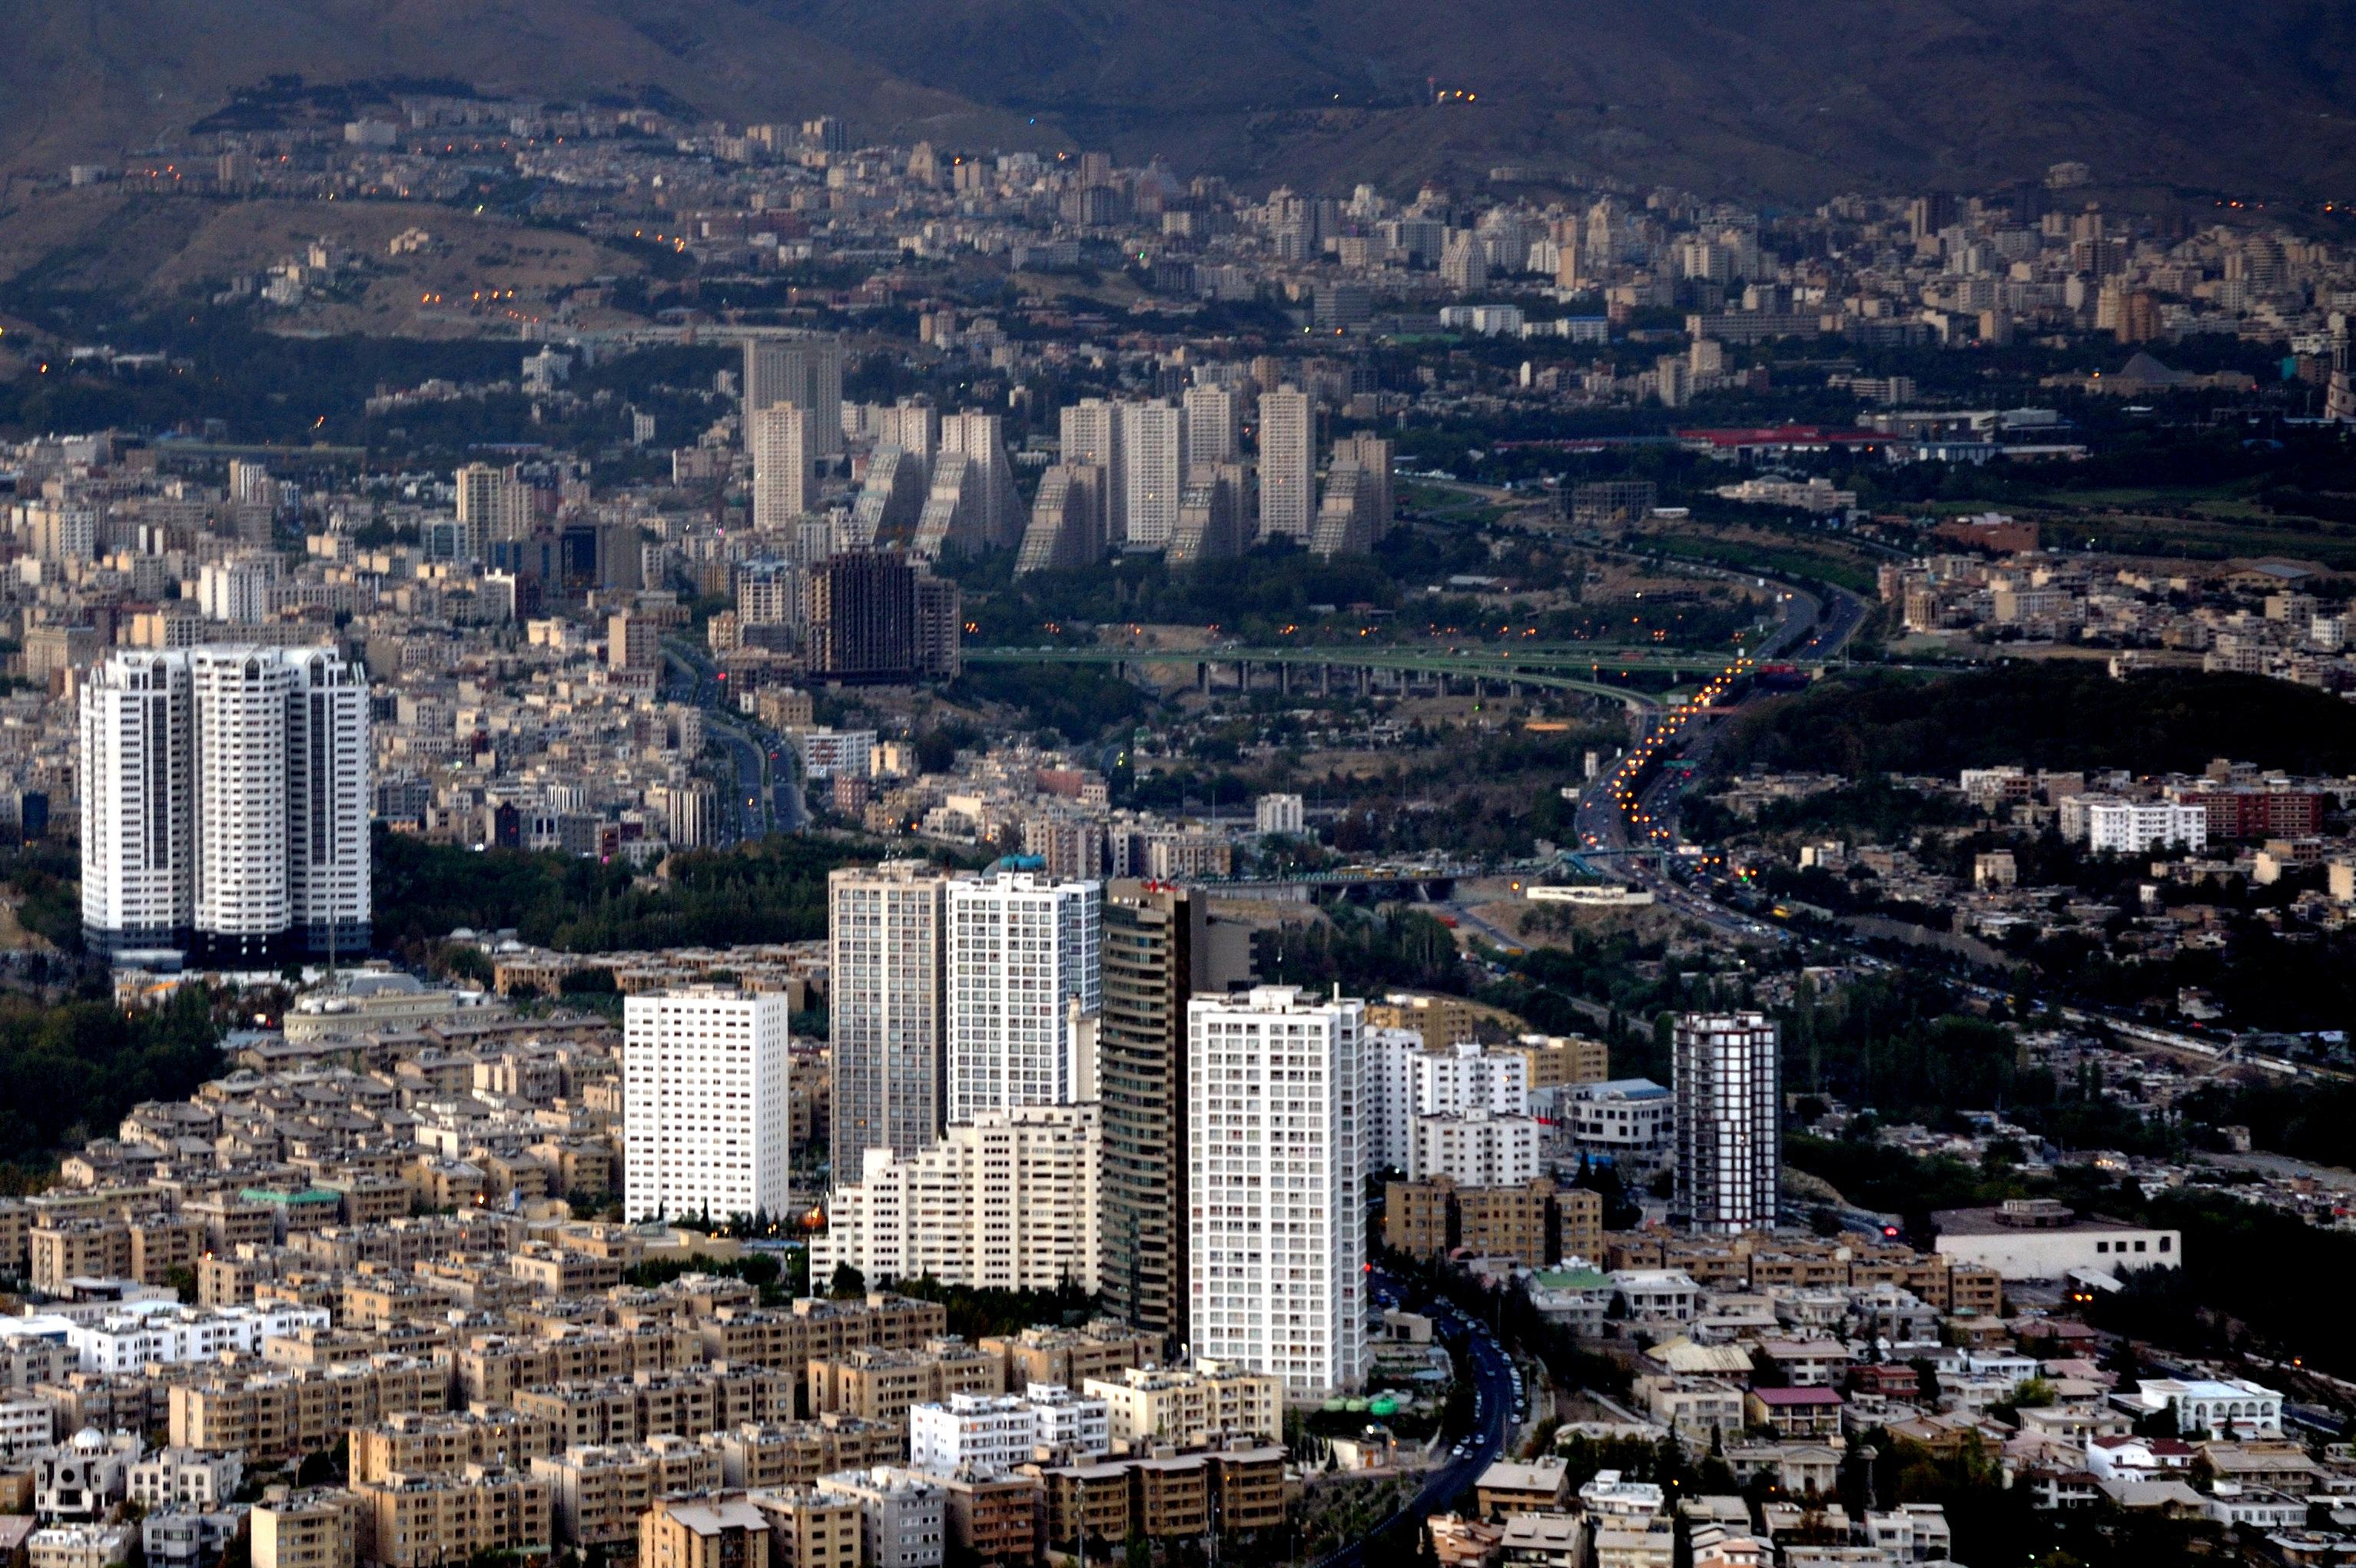 Teheran Pictures 71